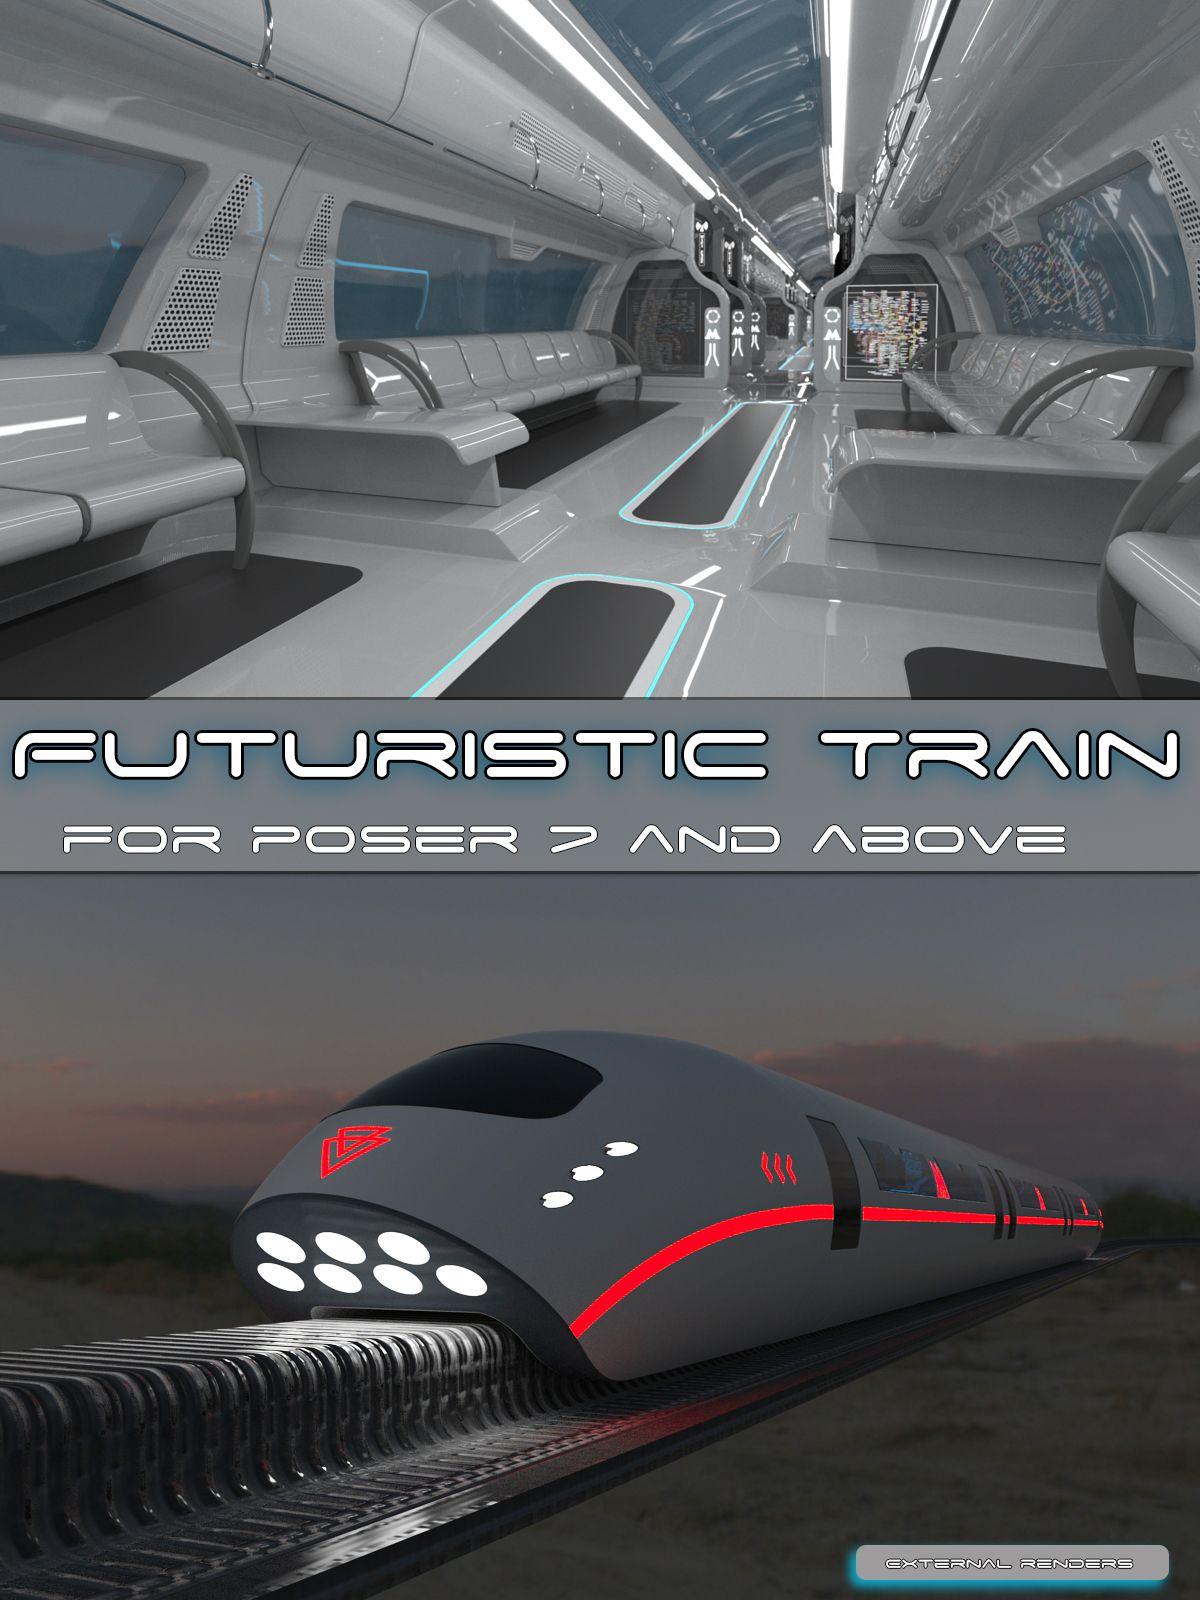 AJ Futuristic Train Futuristic, Futuristic city